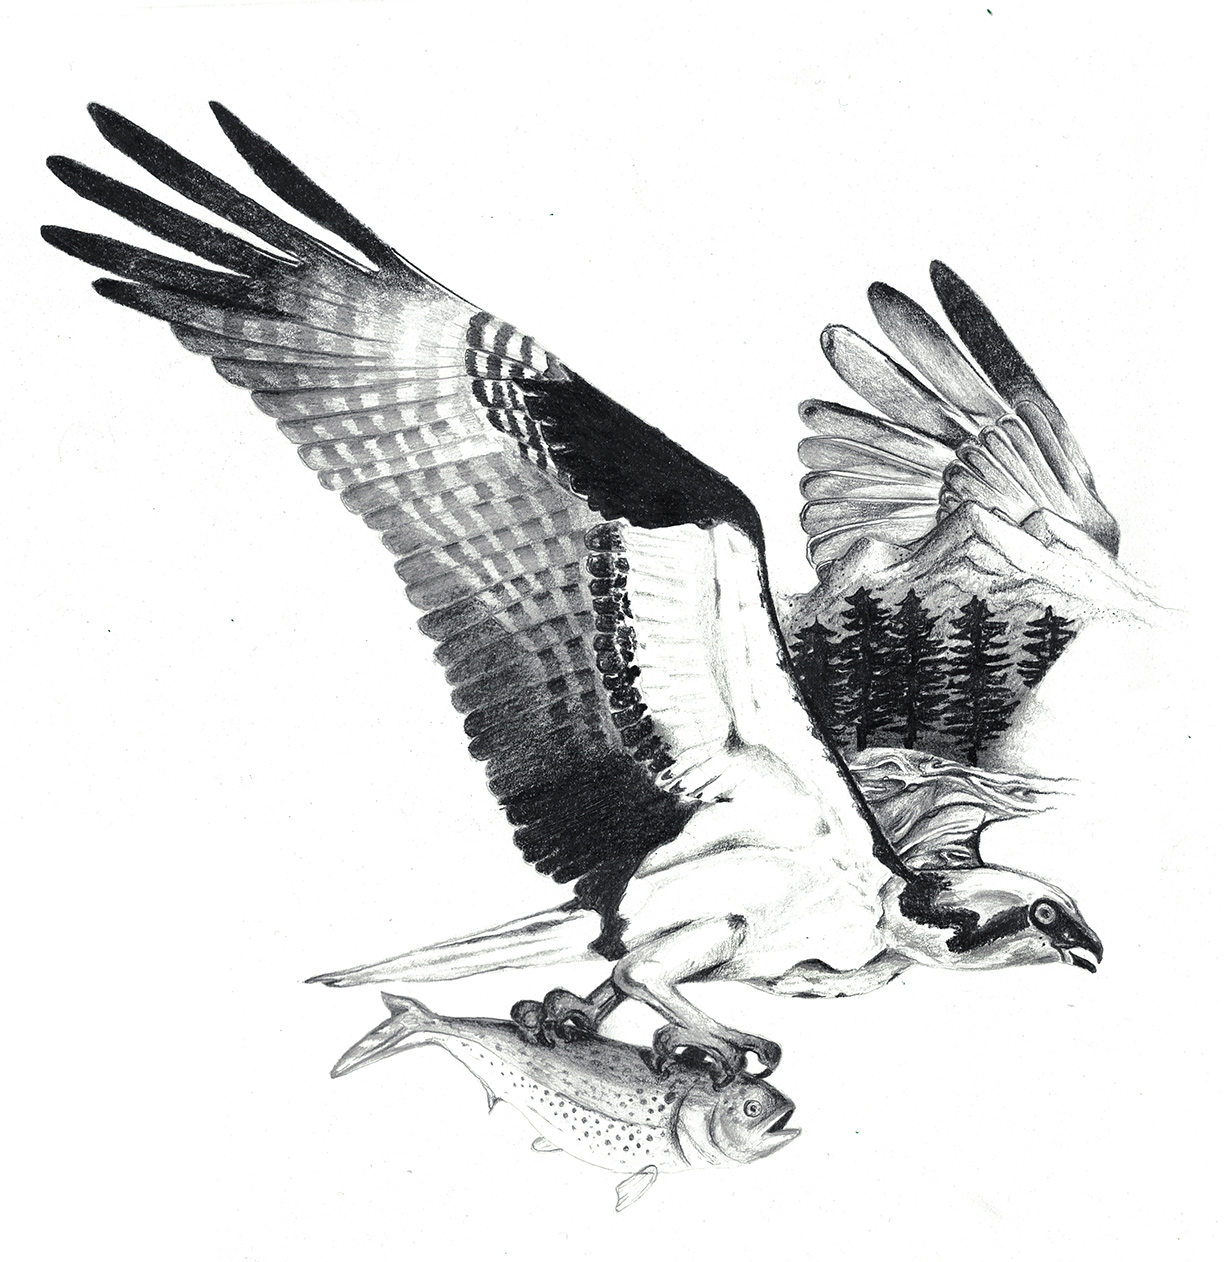 Osprey by LK Weiss